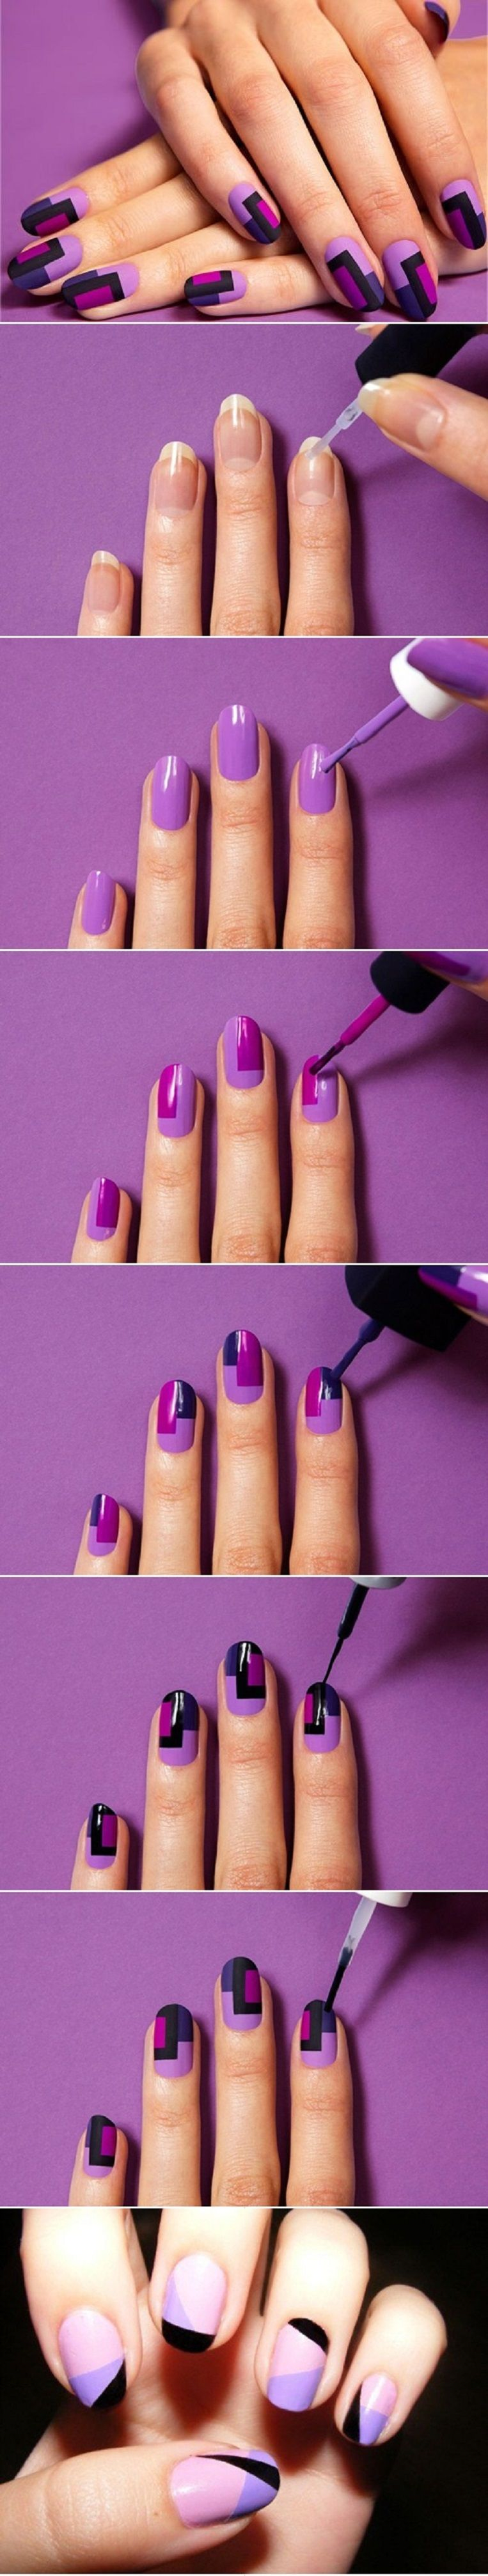 13 Pre-Fall Nail Art Design Tutorials - GleamItUp Note: The last pic ...